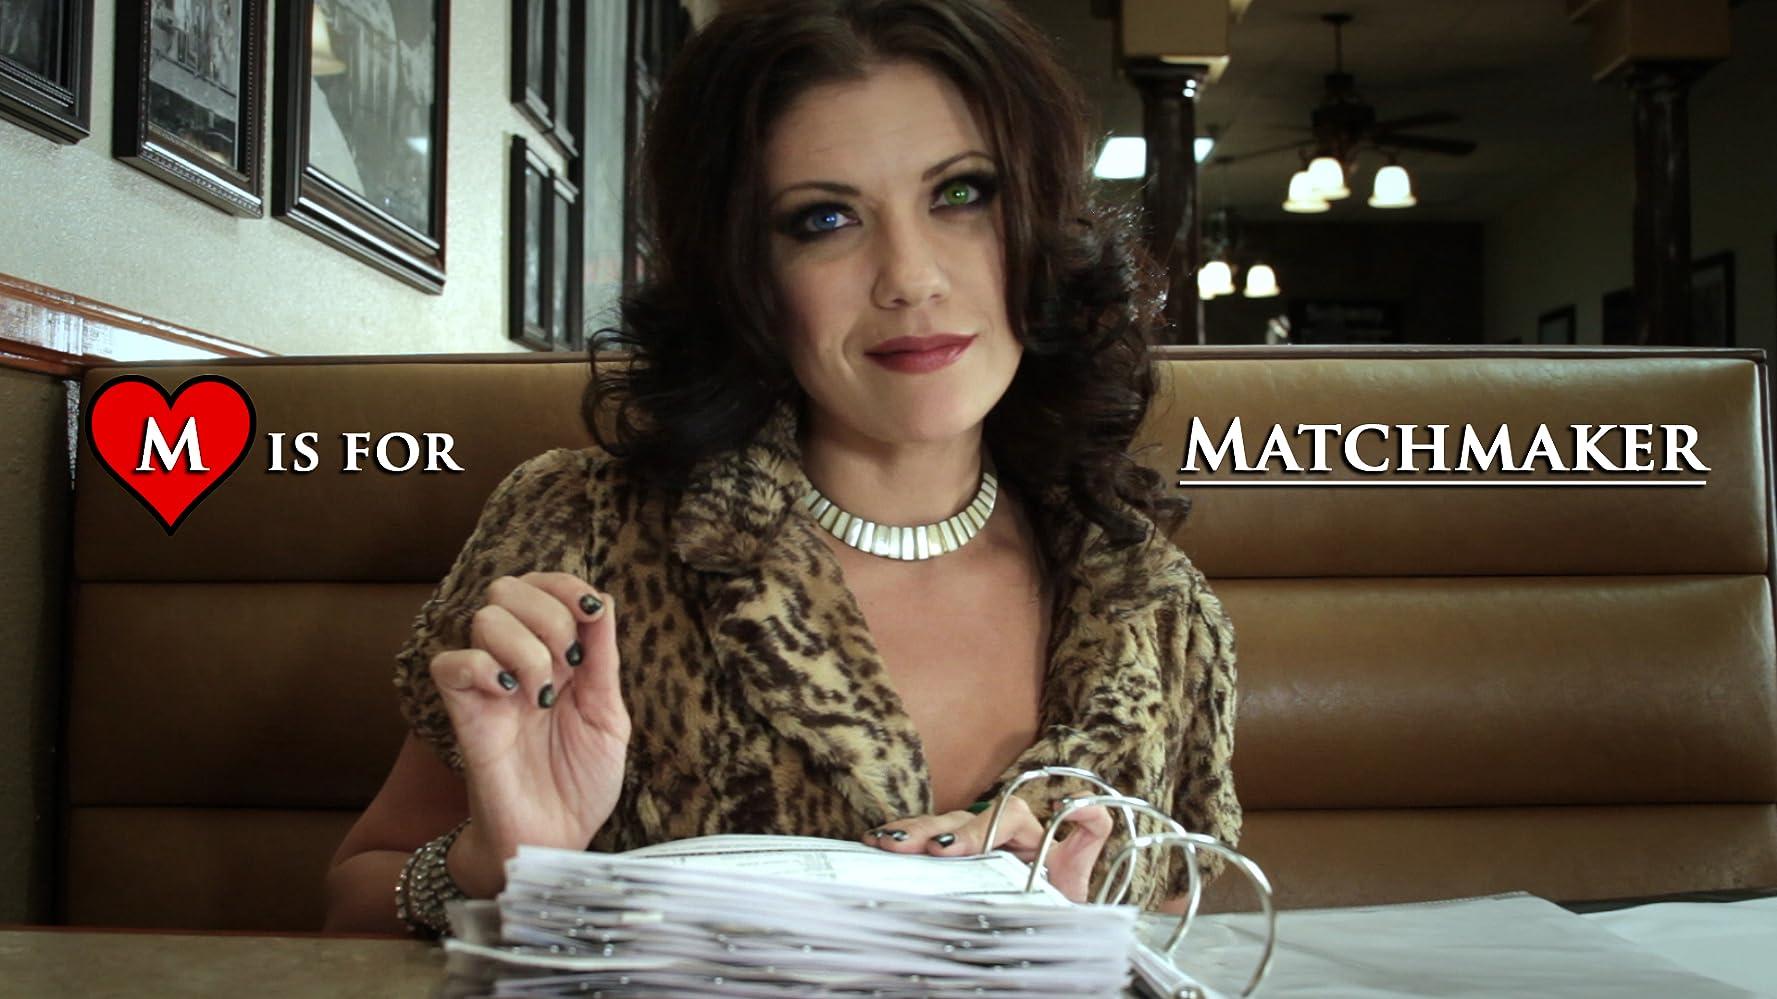 Forum on this topic: Sarah Linda (born 1987), suzzanne-douglas/